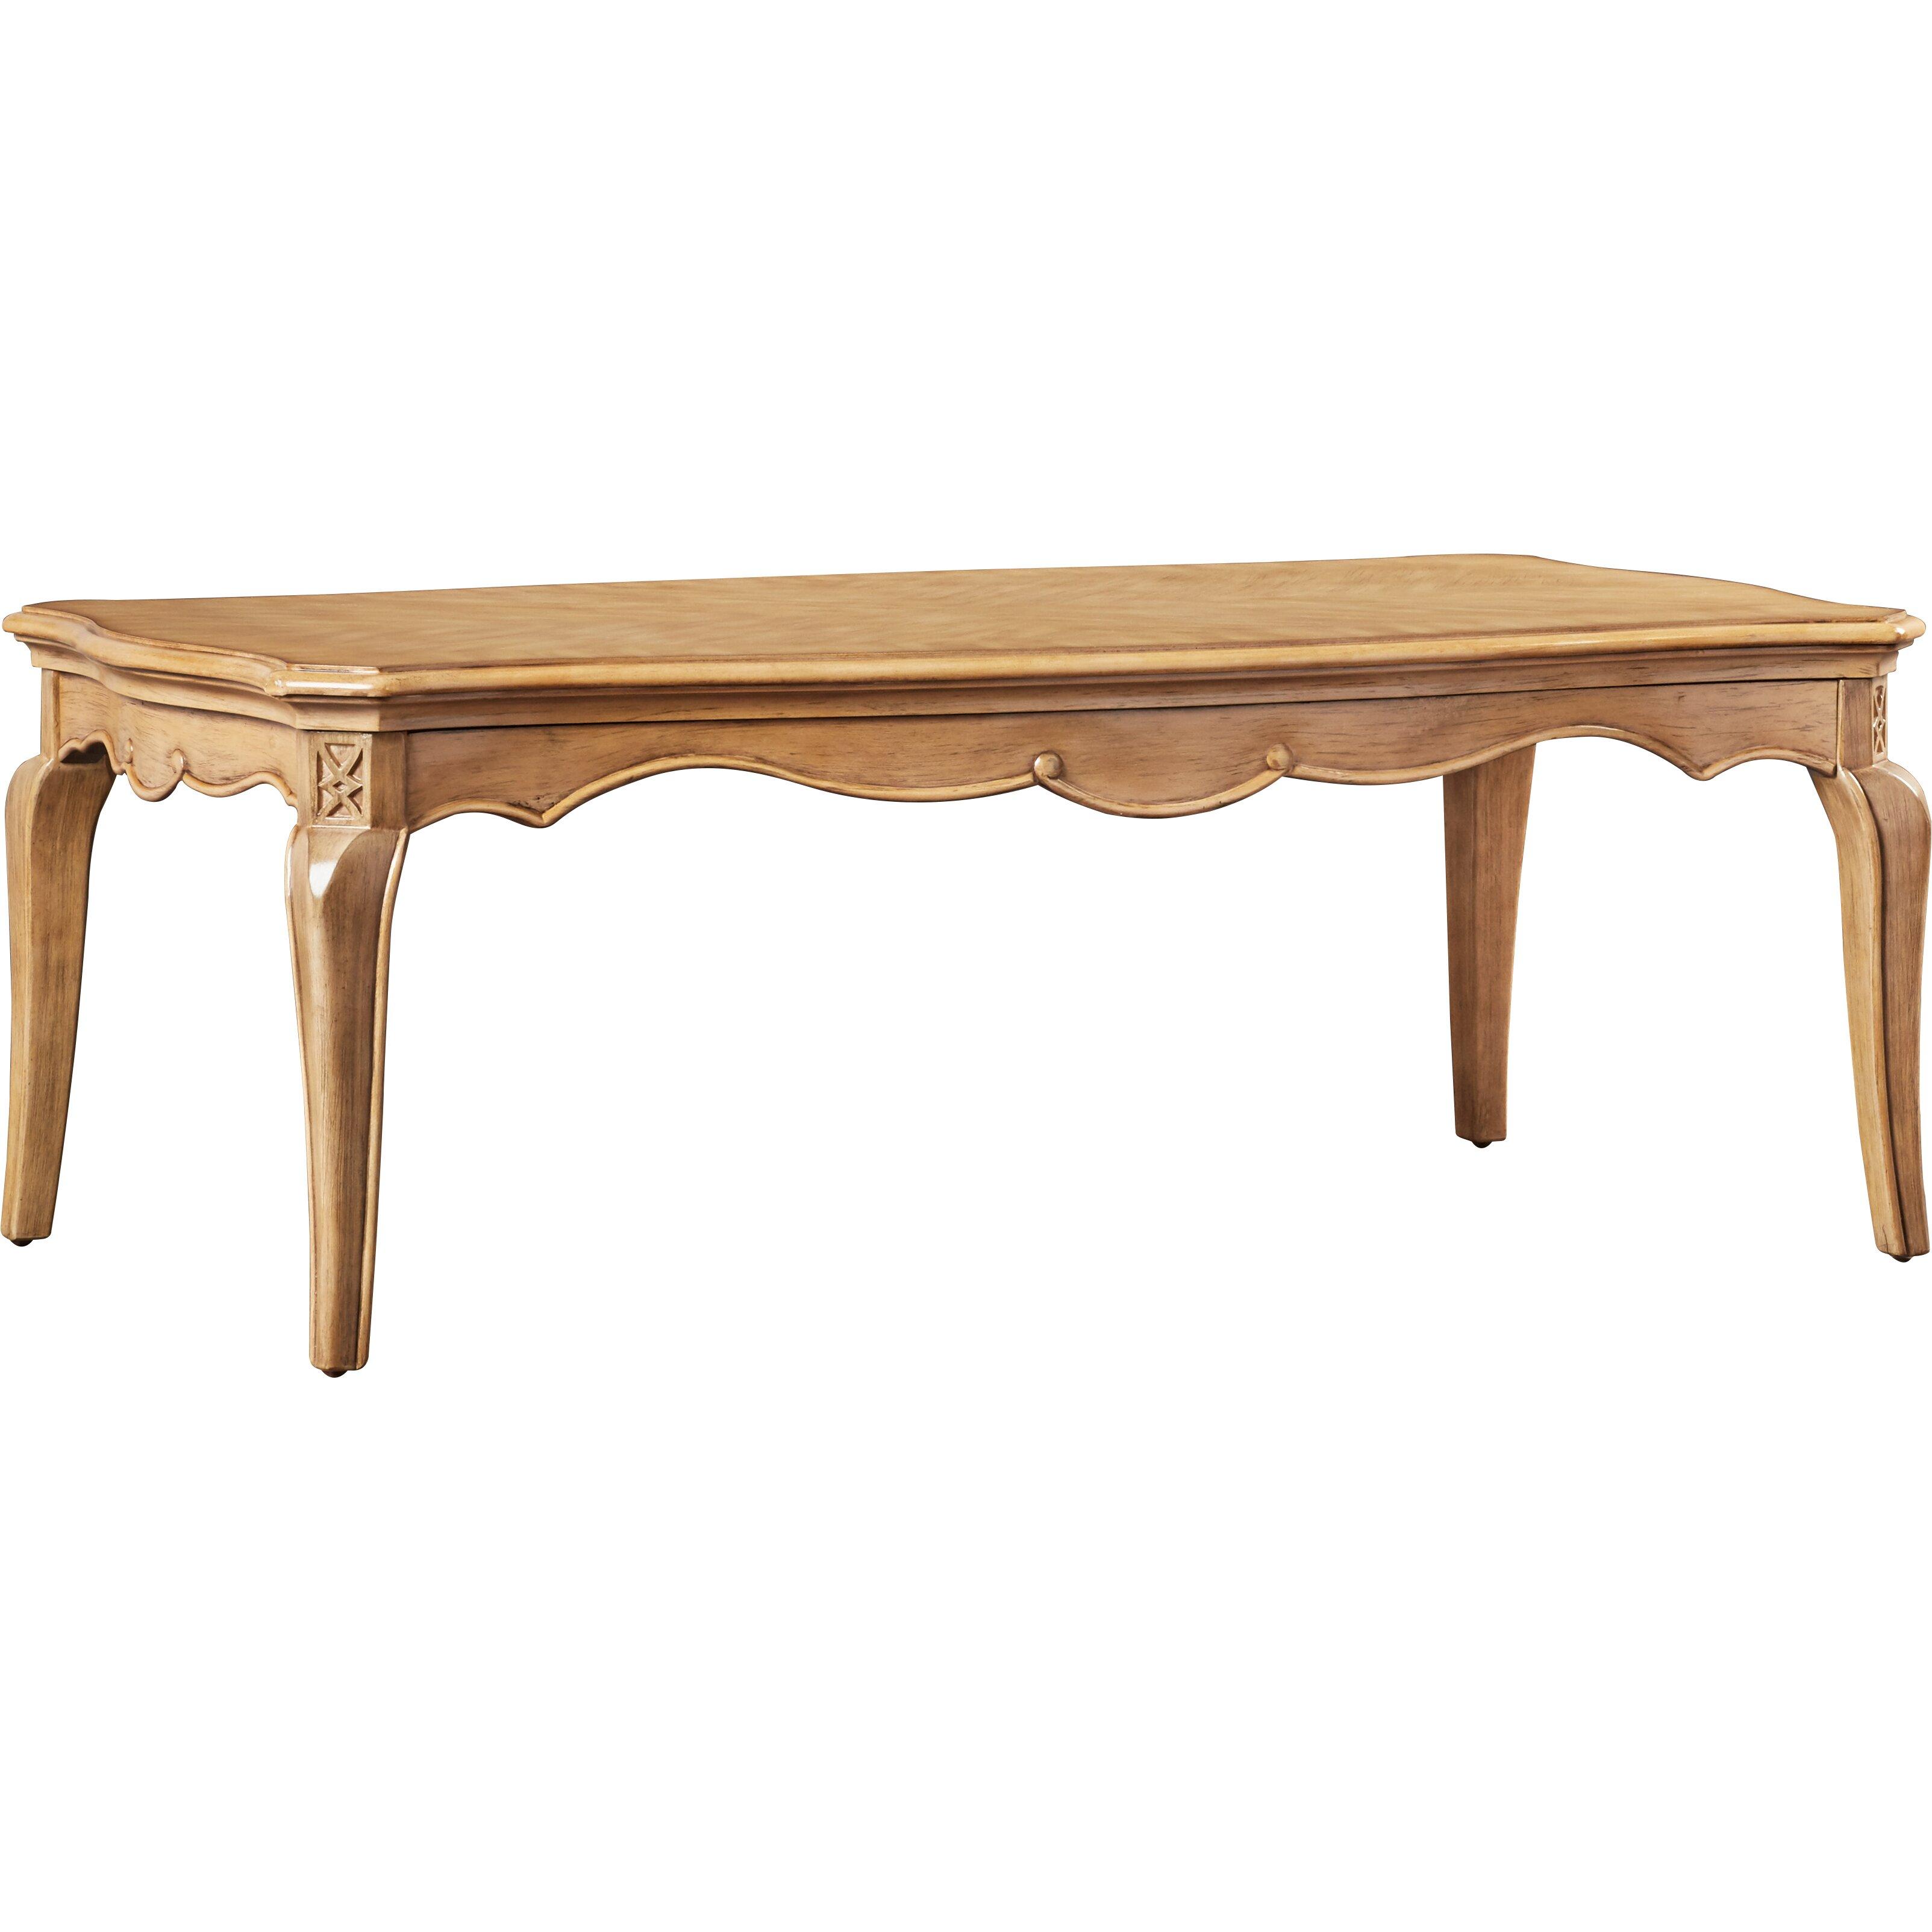 Ellenton Coffee Table With Storage: Astoria Grand Bainbridge Neck Coffee Table & Reviews